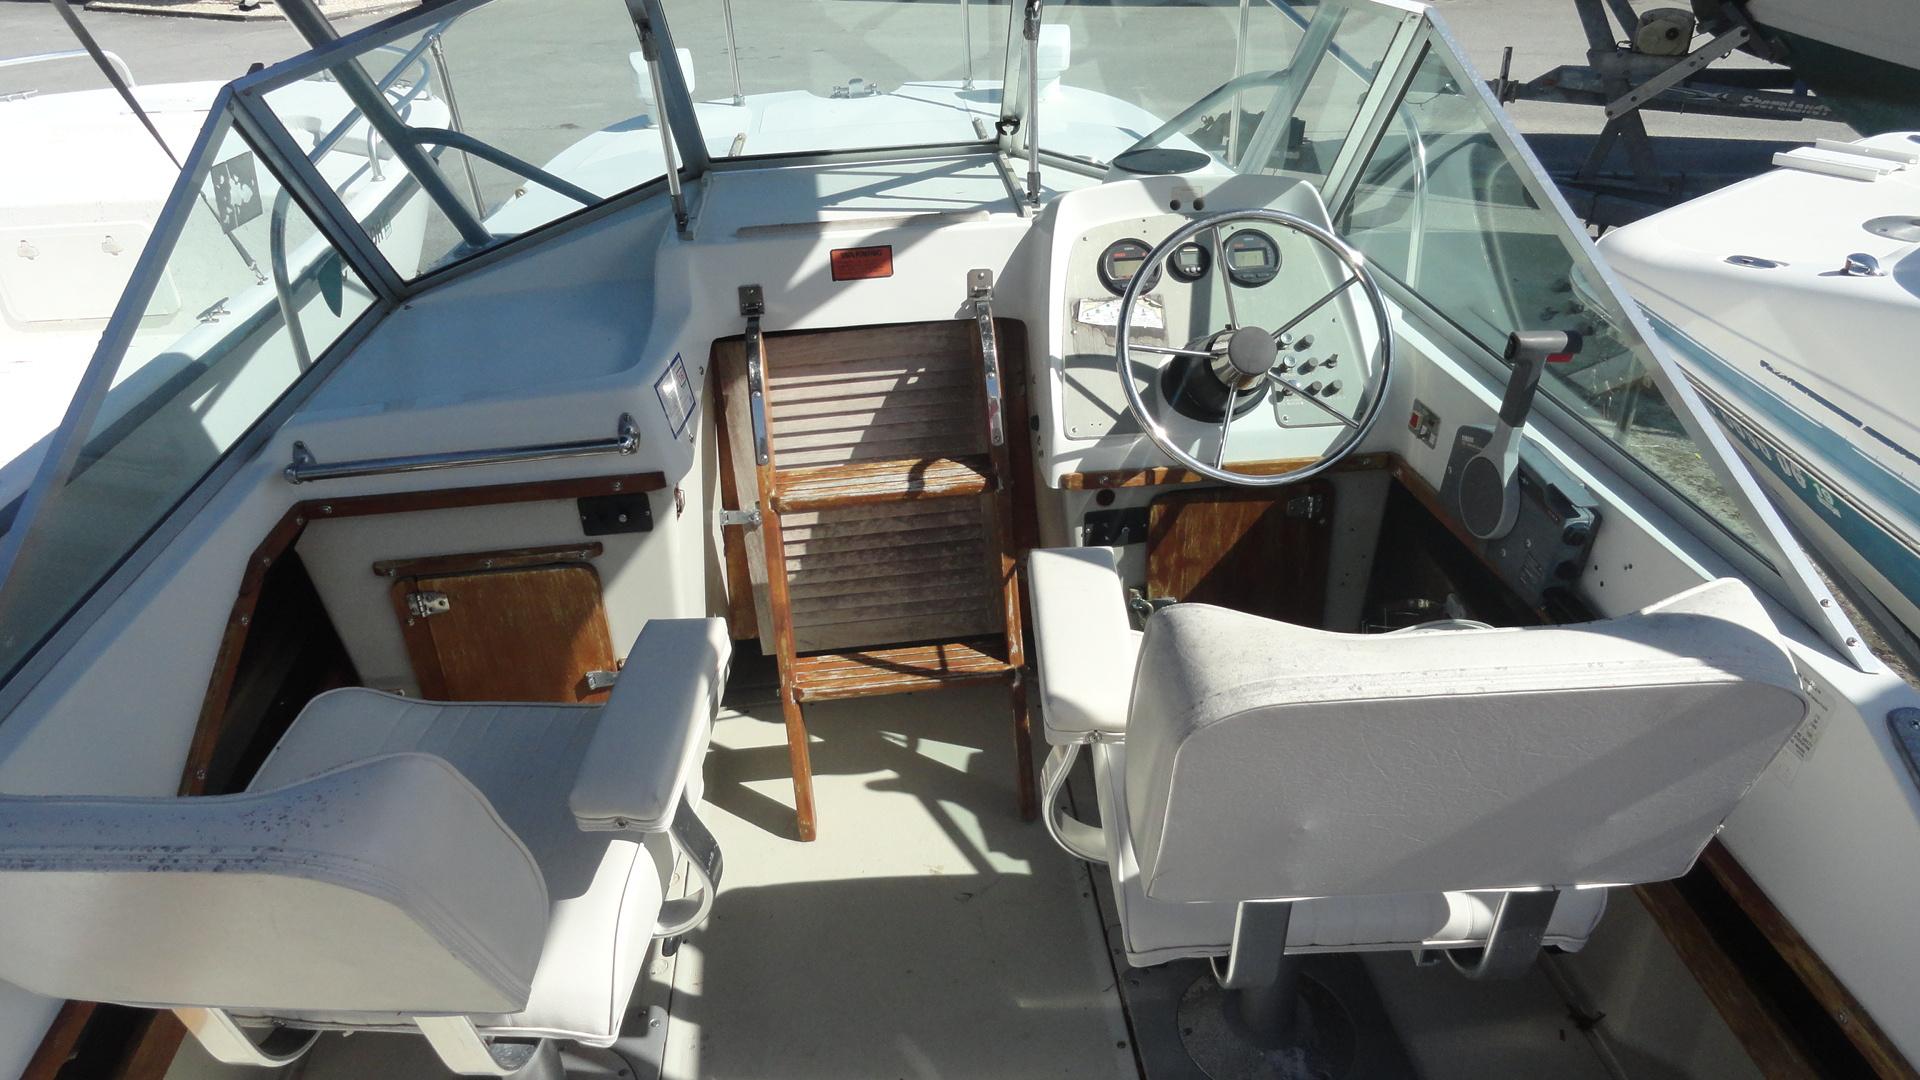 https://0201.nccdn.net/4_2/000/000/07a/ec5/Dorsett--Inside-of-boat-1920x1080.jpg